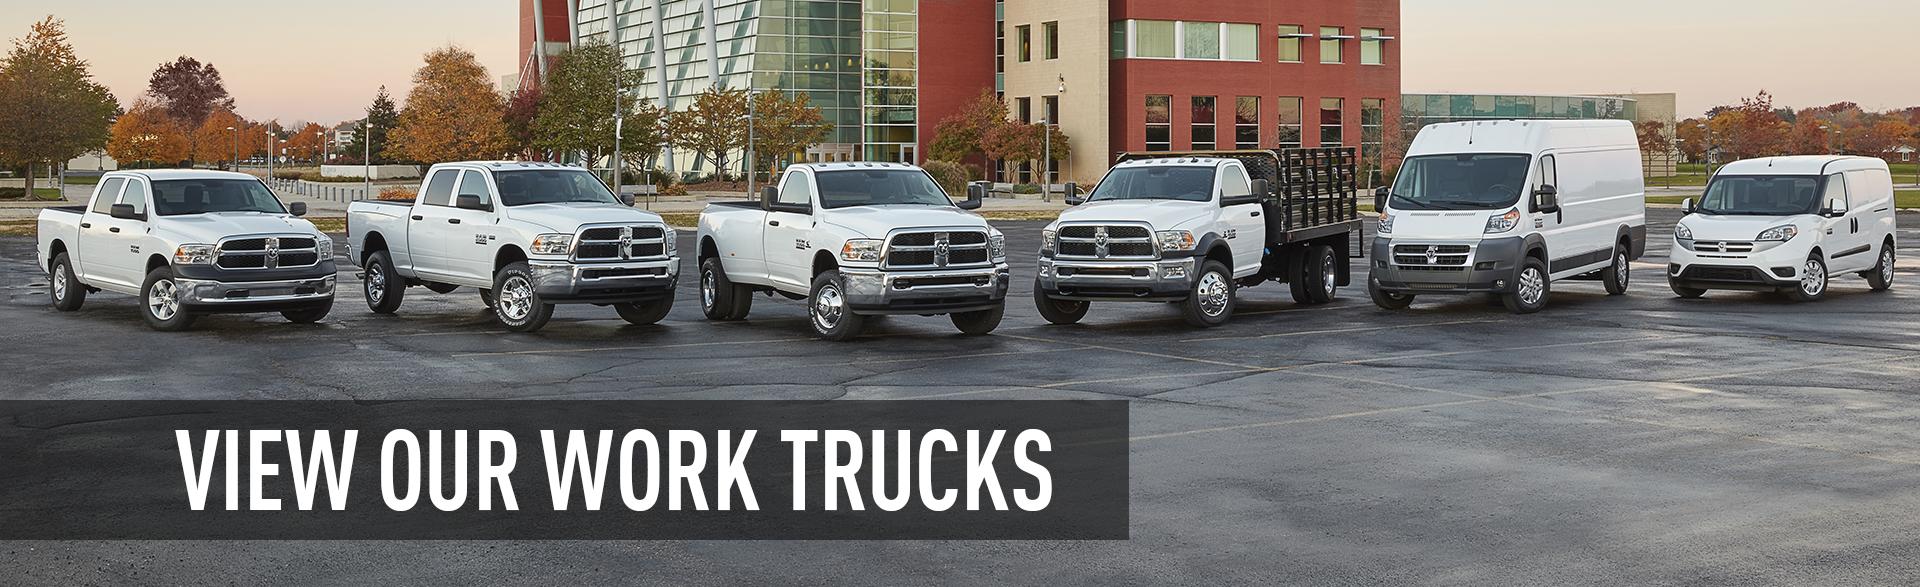 Work Trucks